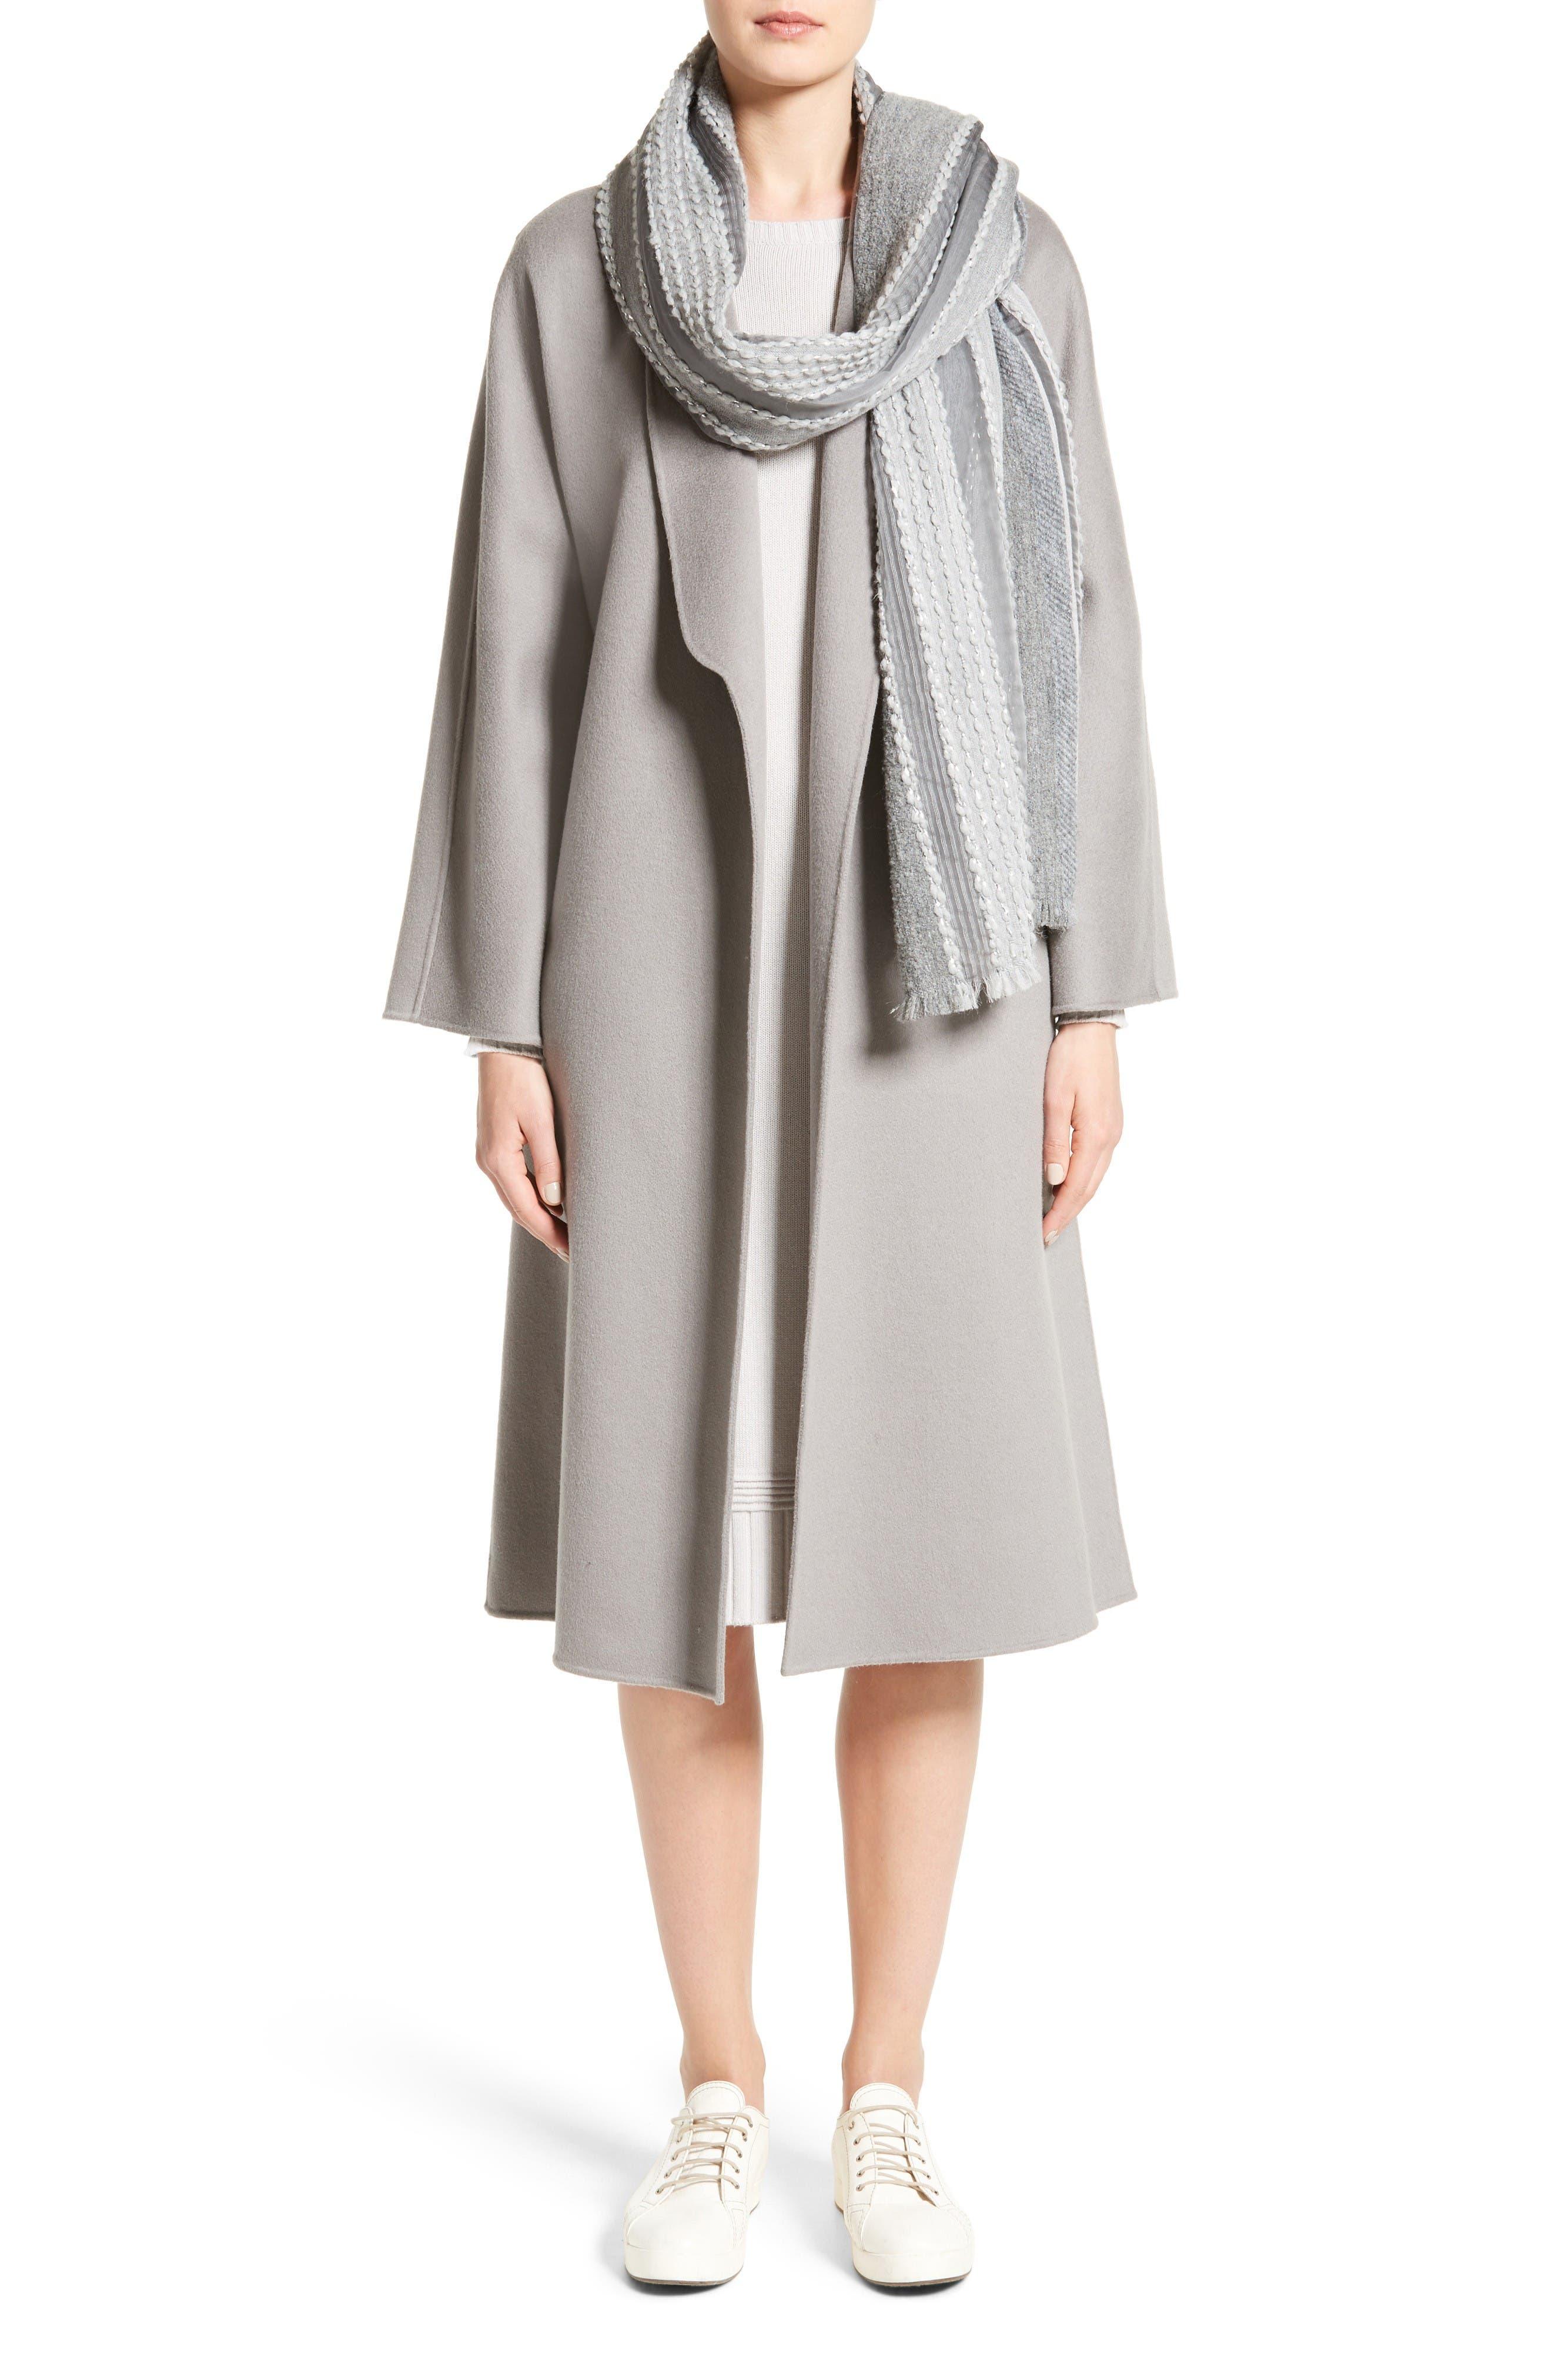 Armani Jeans Knit Sweater Dress,                             Alternate thumbnail 7, color,                             Light Grey